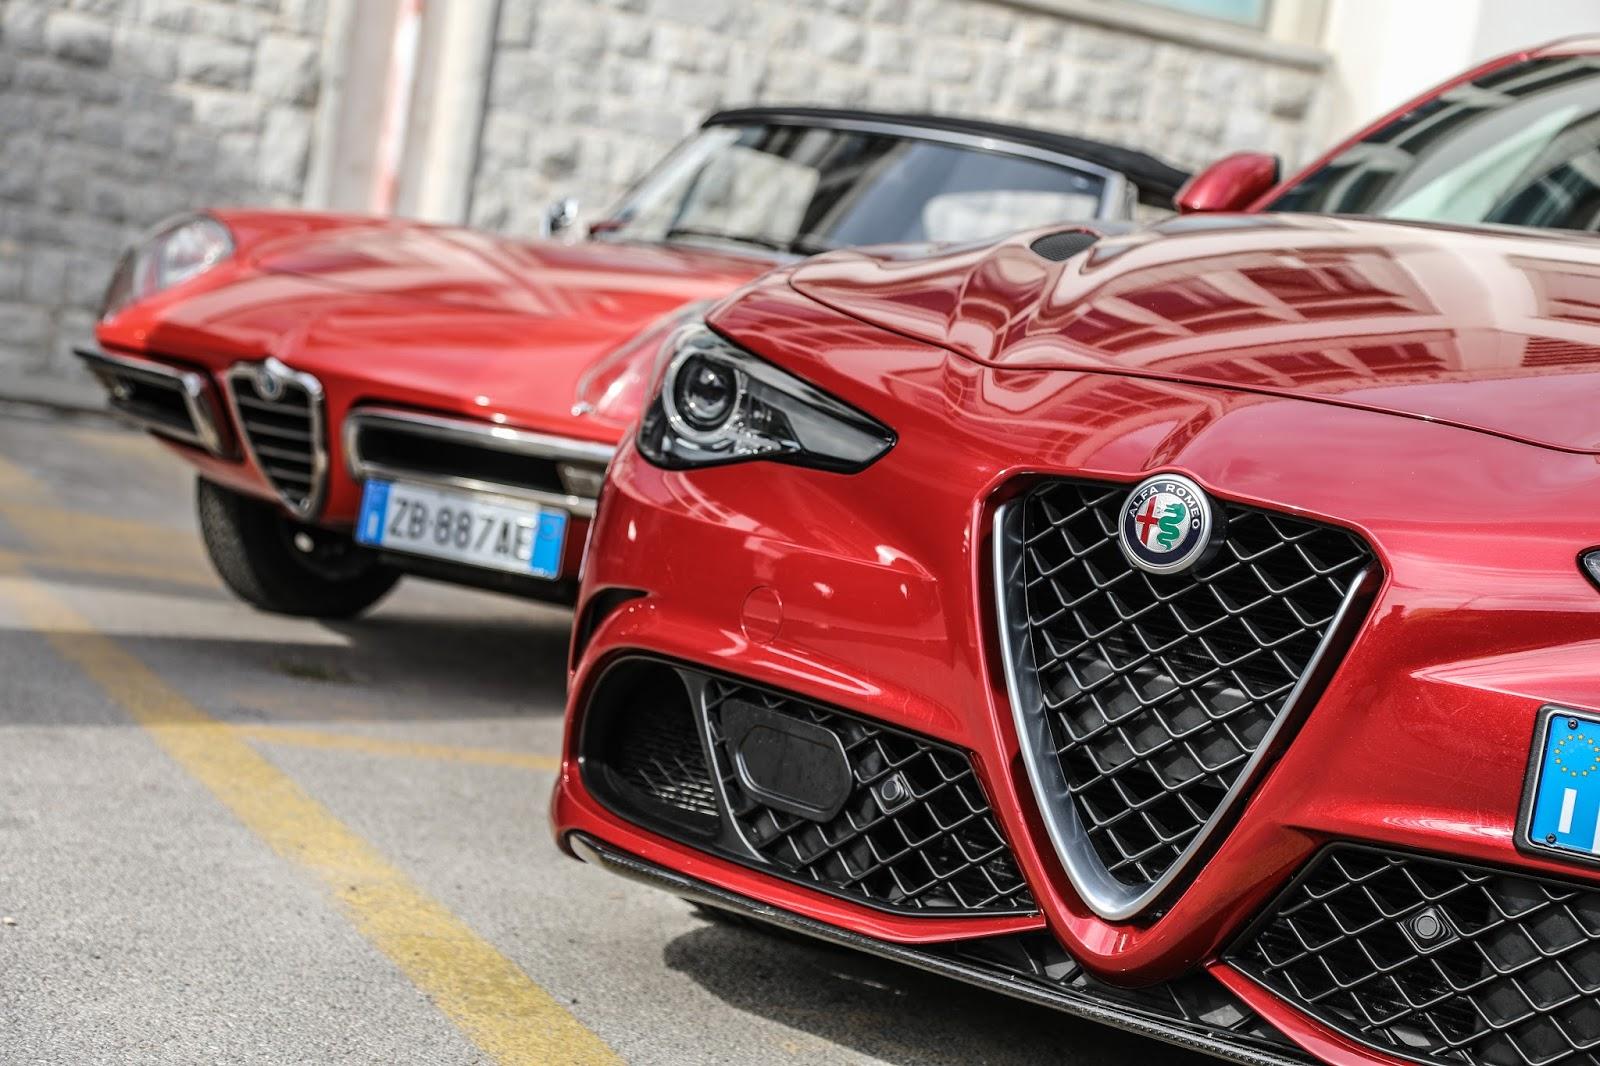 170420 Alfa Romeo On Air 02 H 1960 Giulietta SZ στο 101ο Targa Florio Alfa, alfa romeo, Alfa Romeo Giulietta, Alfa Romeo Giulietta SZ, Classic, Targa Florio, videos, αγωνες